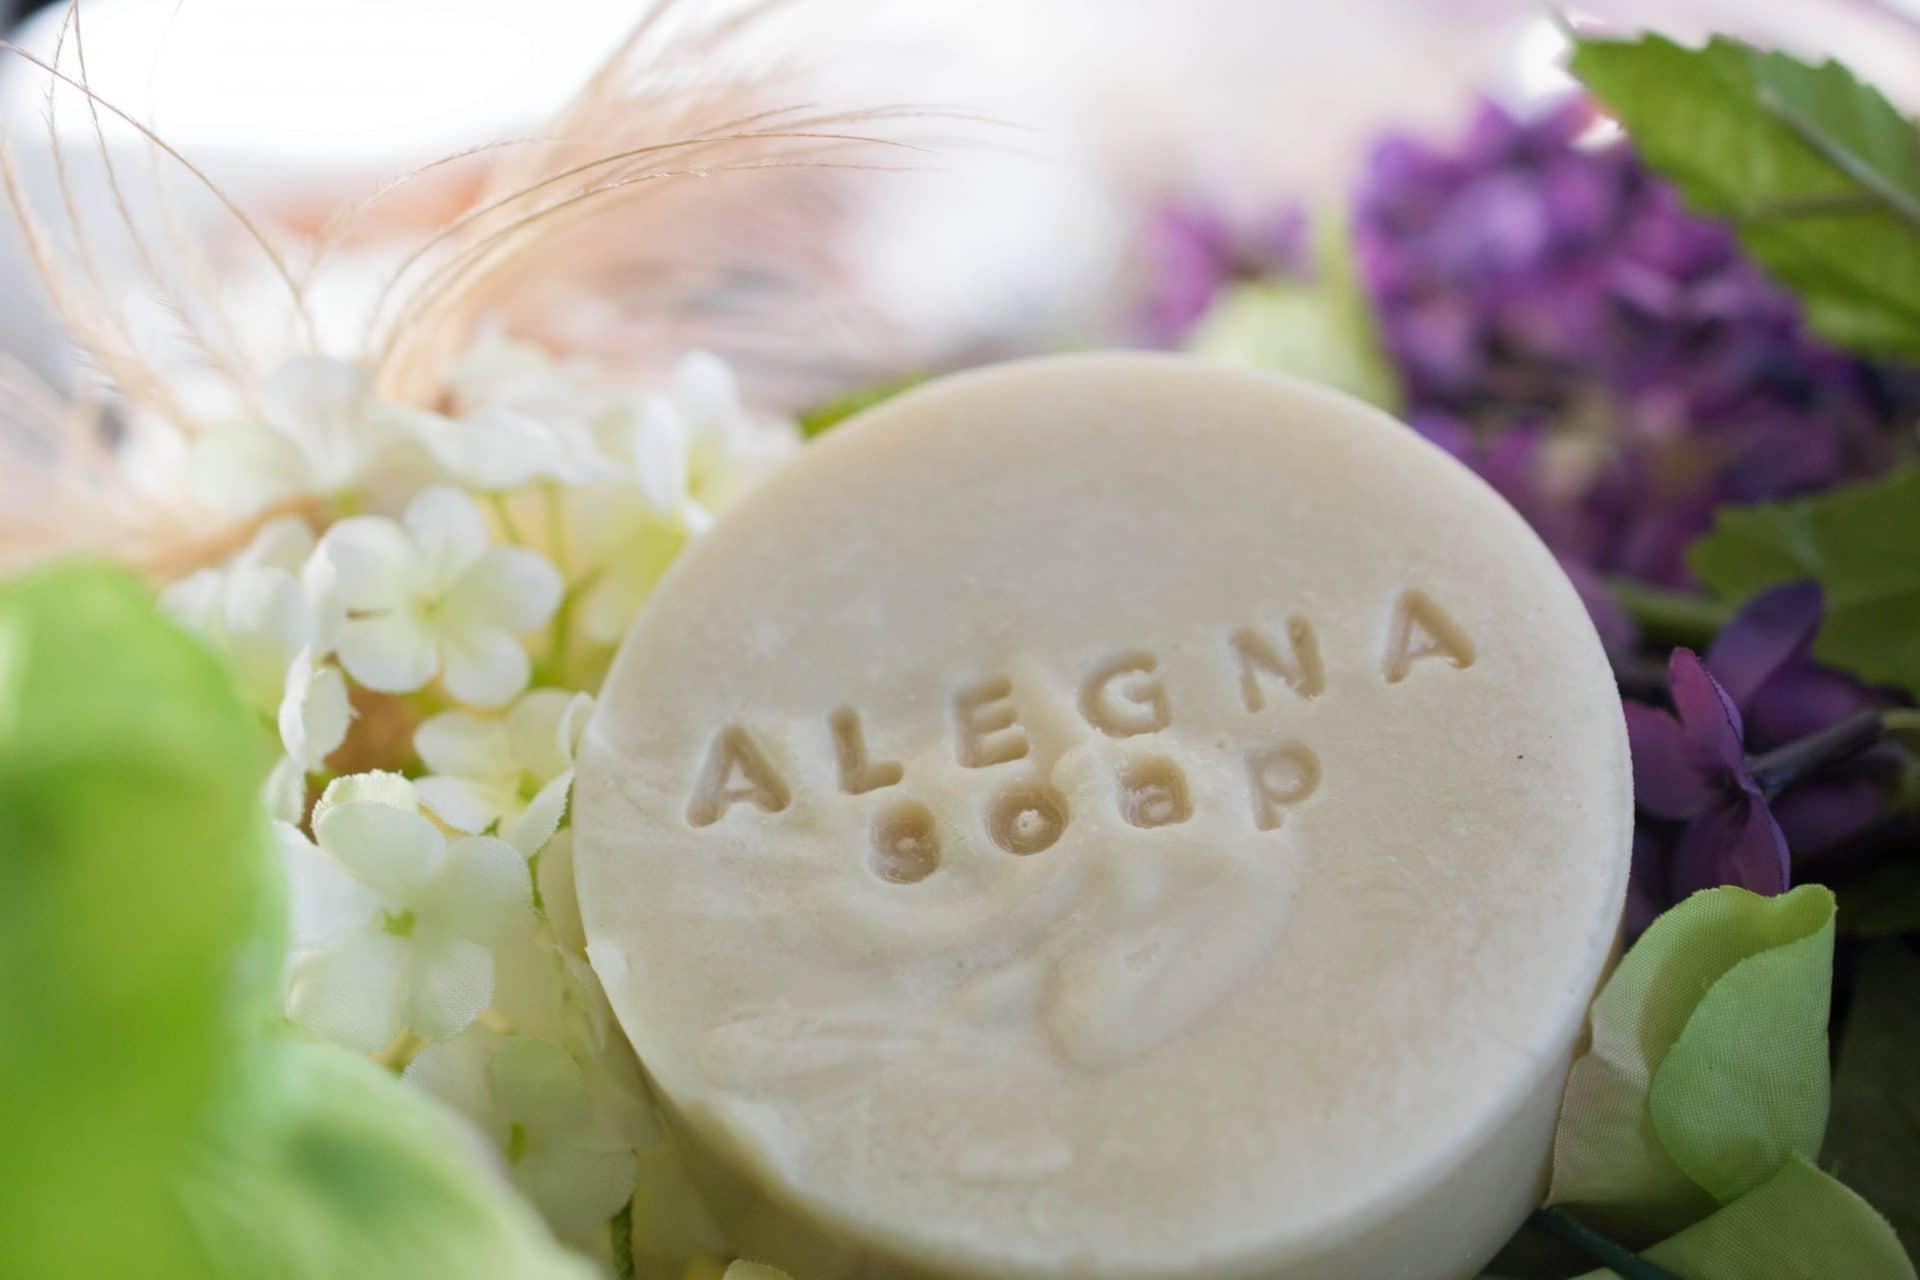 Alegna Soap® Shaving Soap